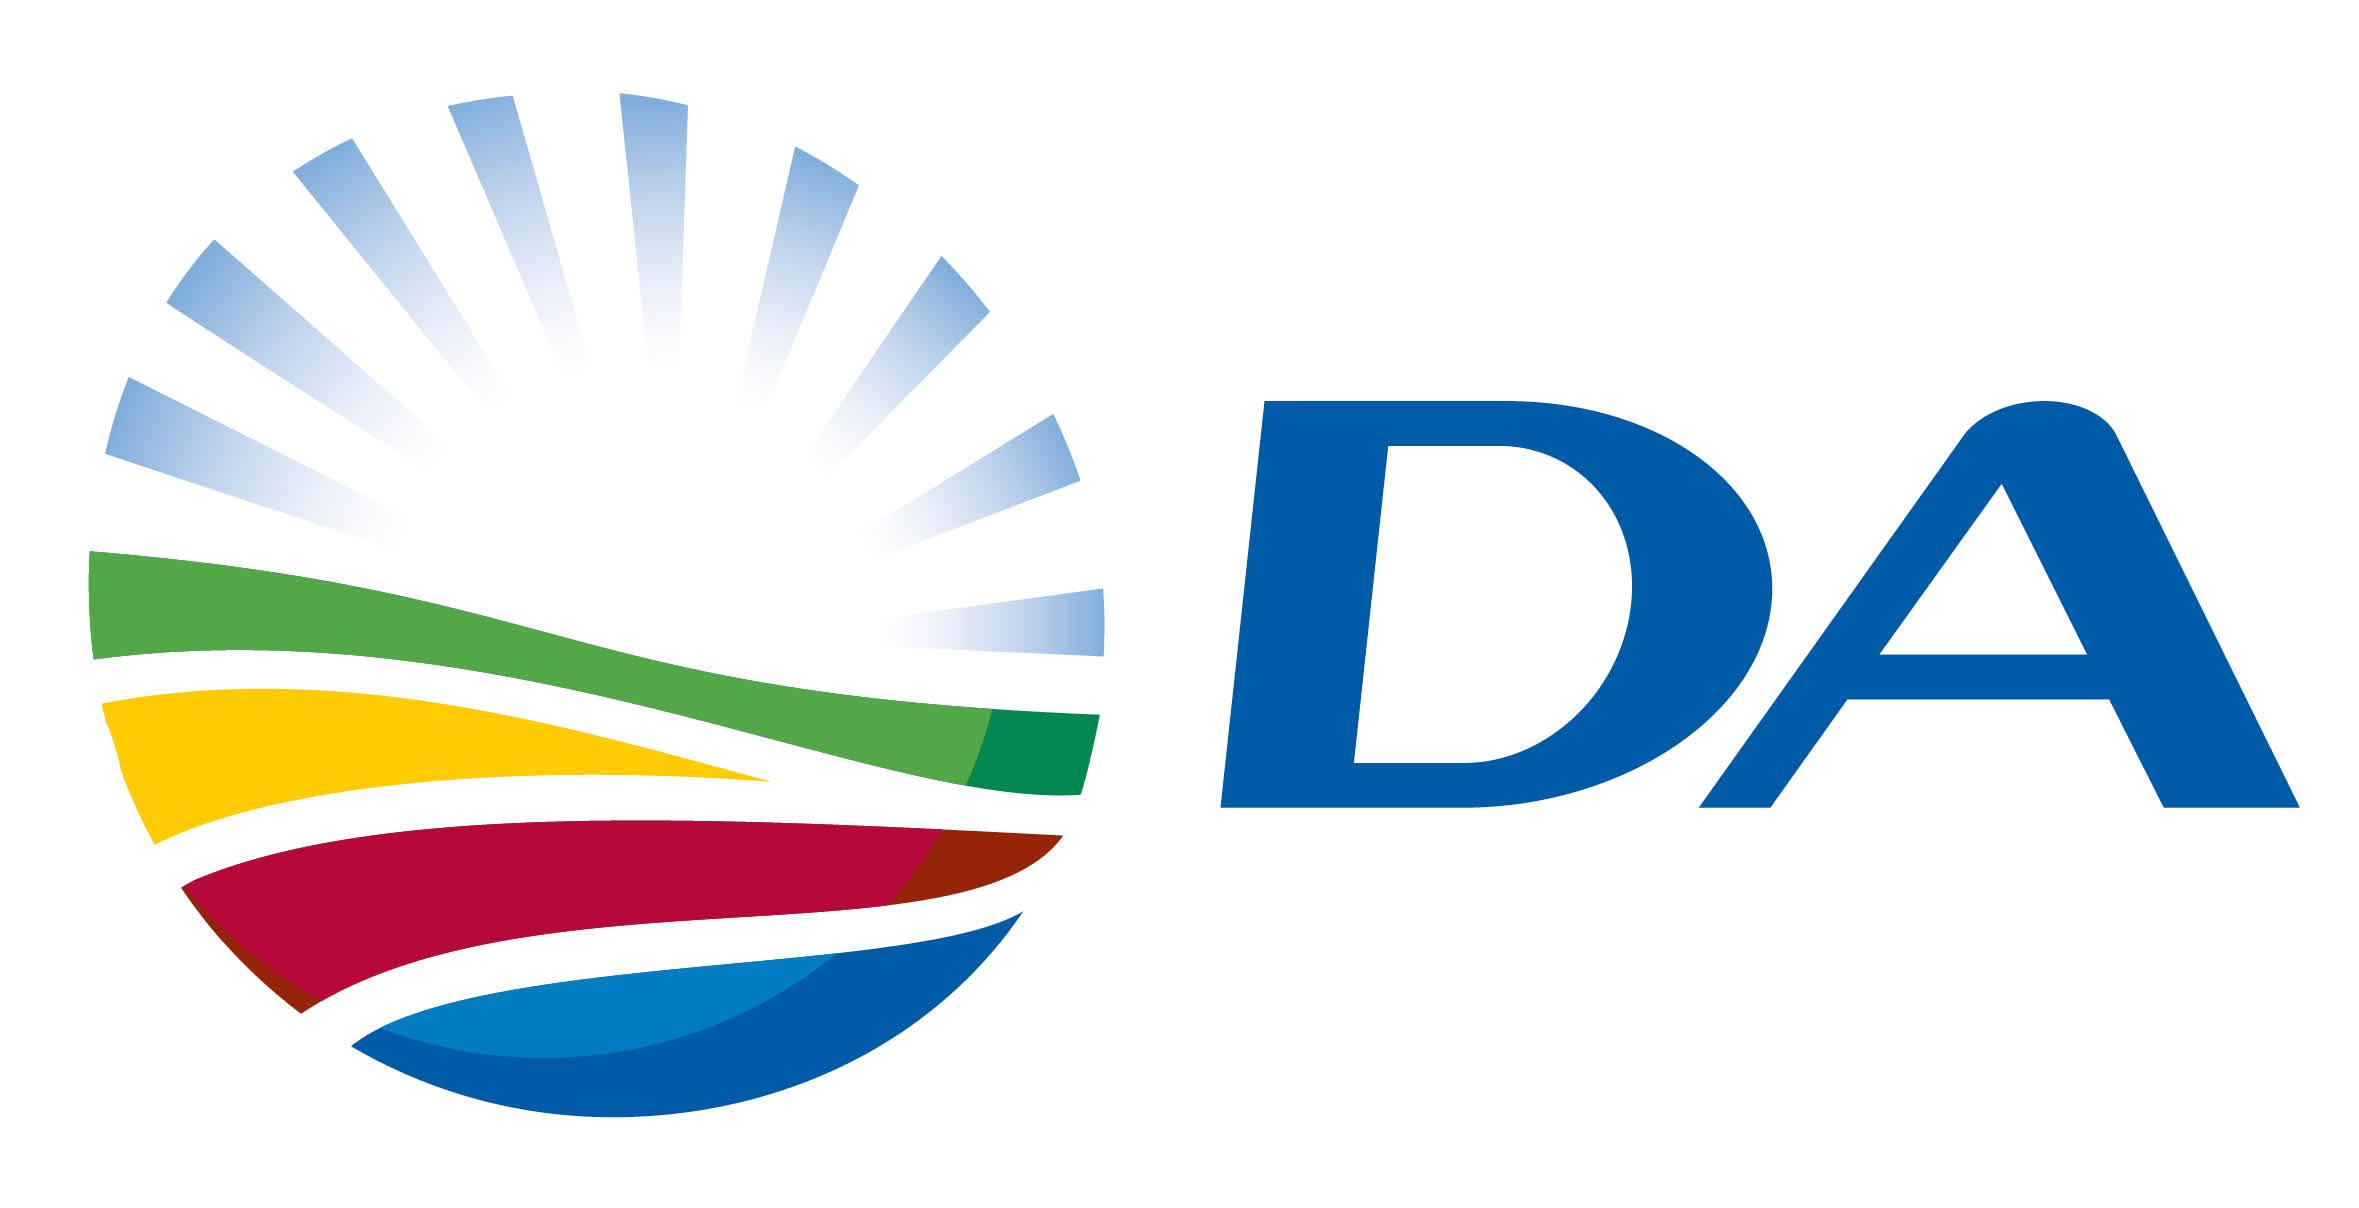 DA notes the resignation of CEO, Paul Boughey